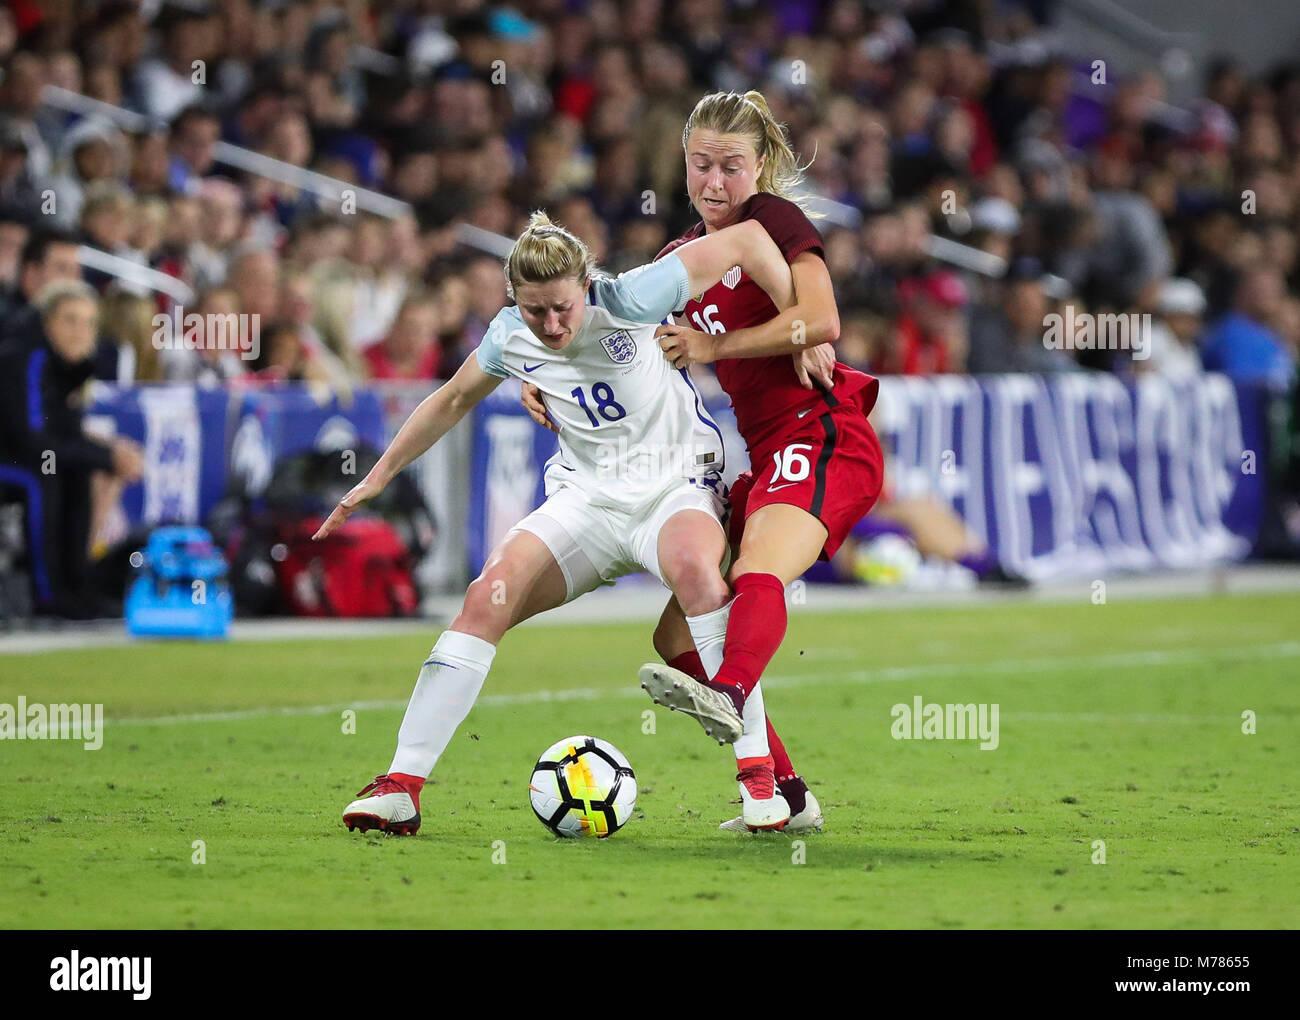 Orlando, Florida, USA. 7th Mar, 2018. England forward Ellen White (18) battles for ball possession with Unites States - Stock Image